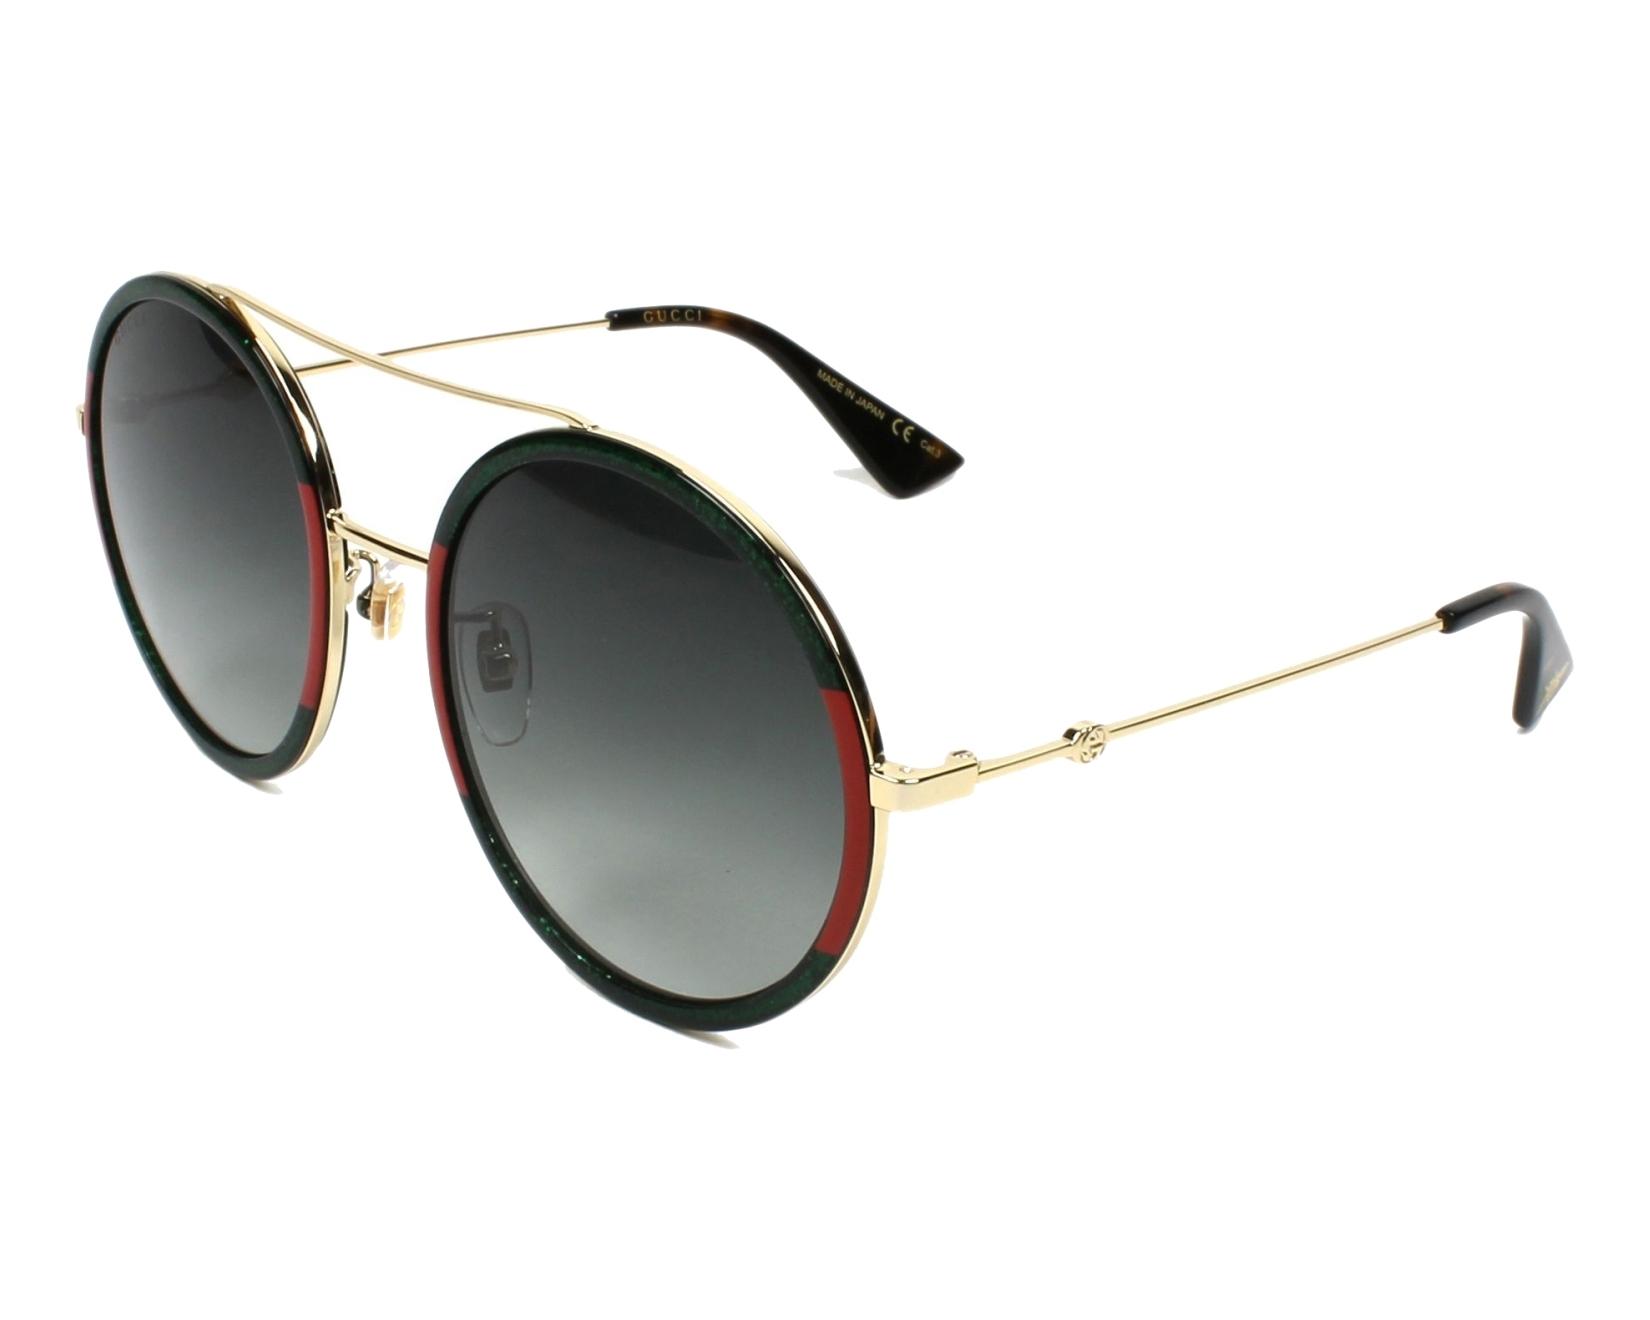 bcd4d85472f Sunglasses Gucci GG-0061-S 008 56-22 Green Red profile view